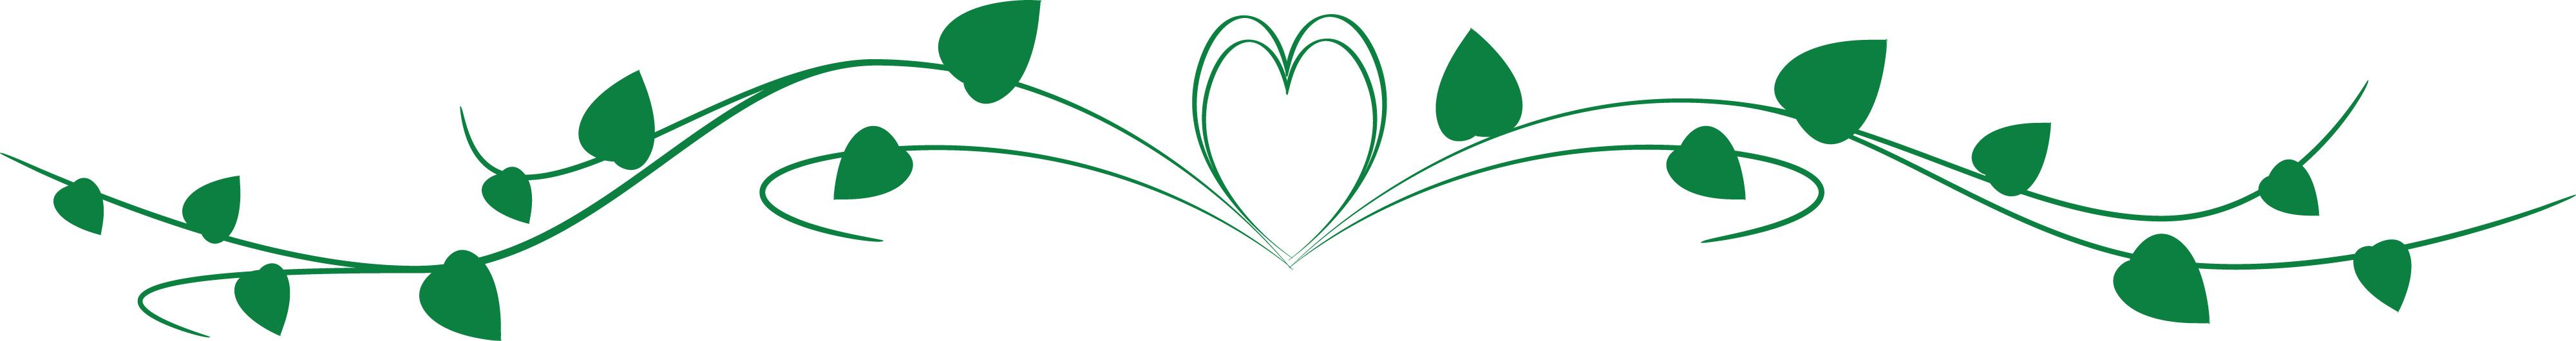 Heart clip art arts. Hearts clipart vine